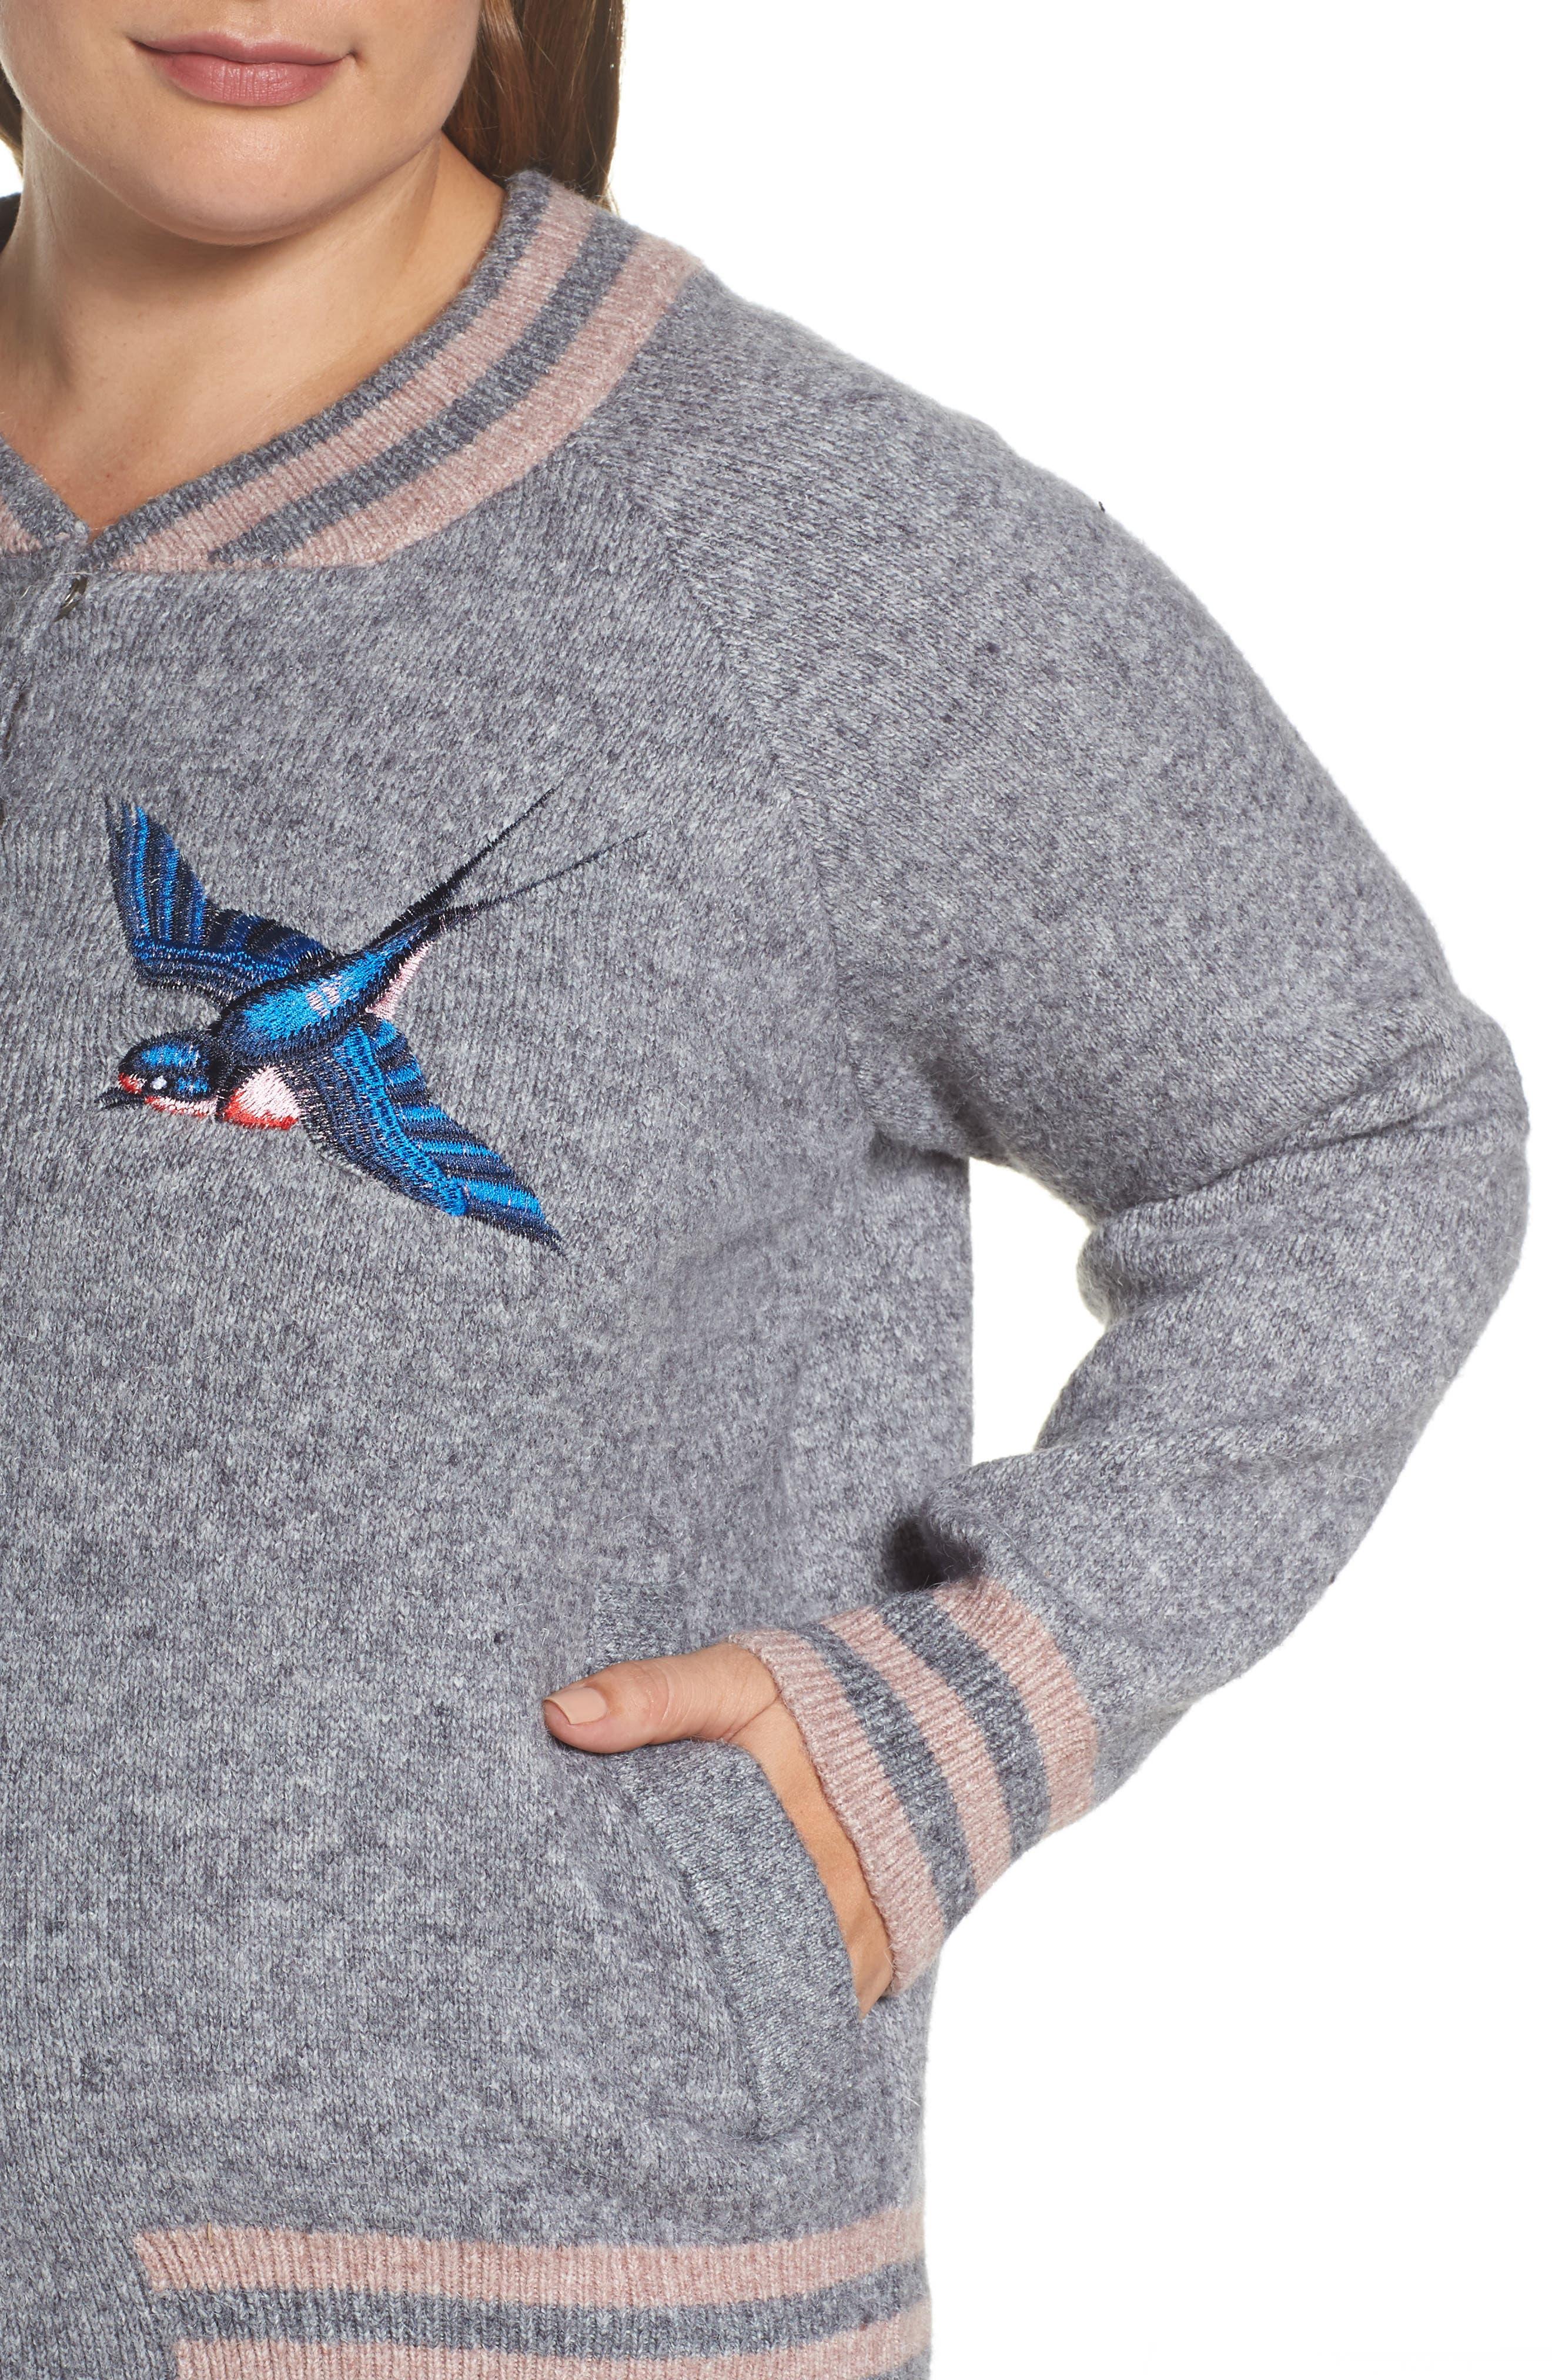 Zanja Embroidered Knit Bomber Jacket,                             Alternate thumbnail 4, color,                             034